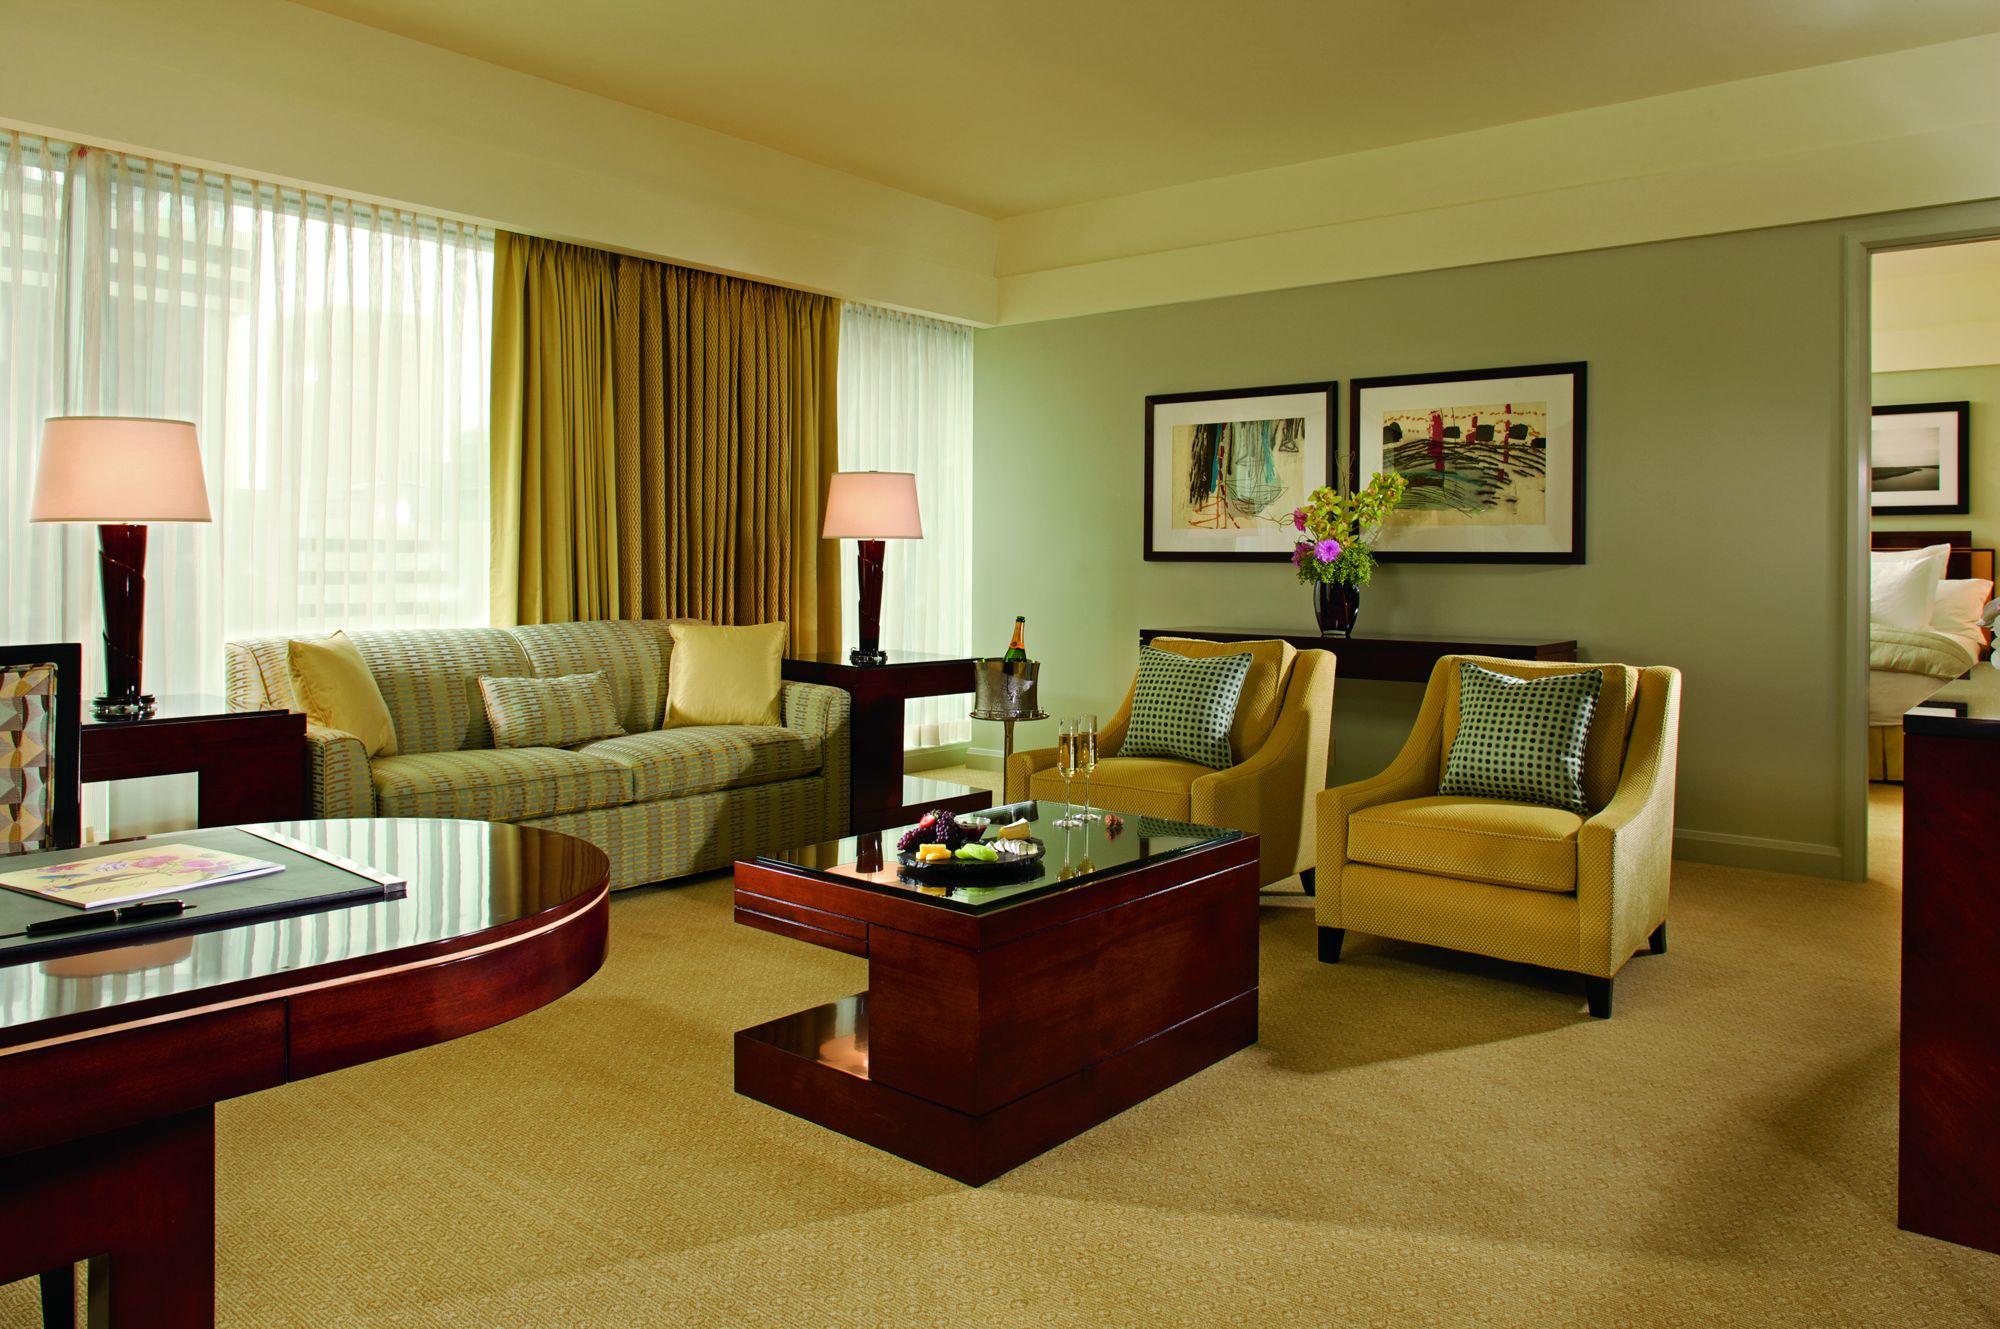 The Ritz-Carlton, Charlotte image 8